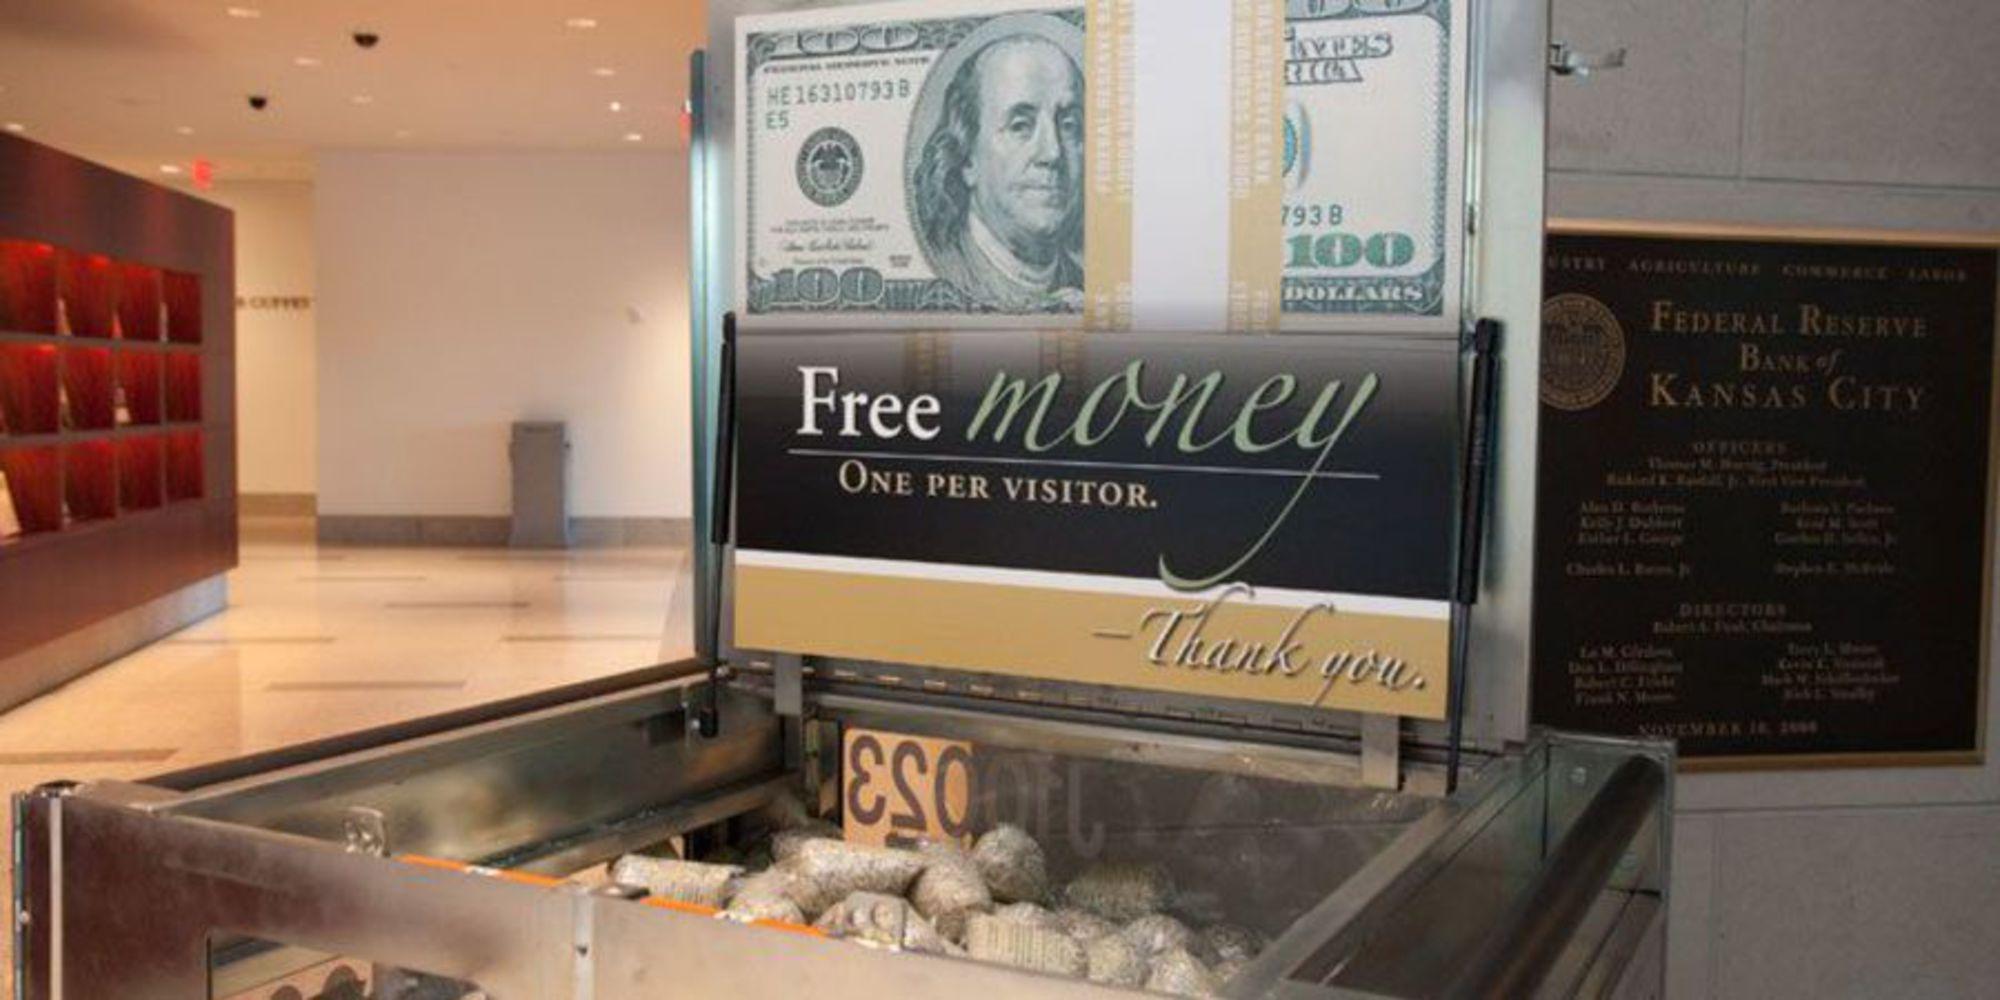 38519 money museum 07 1475.thumb